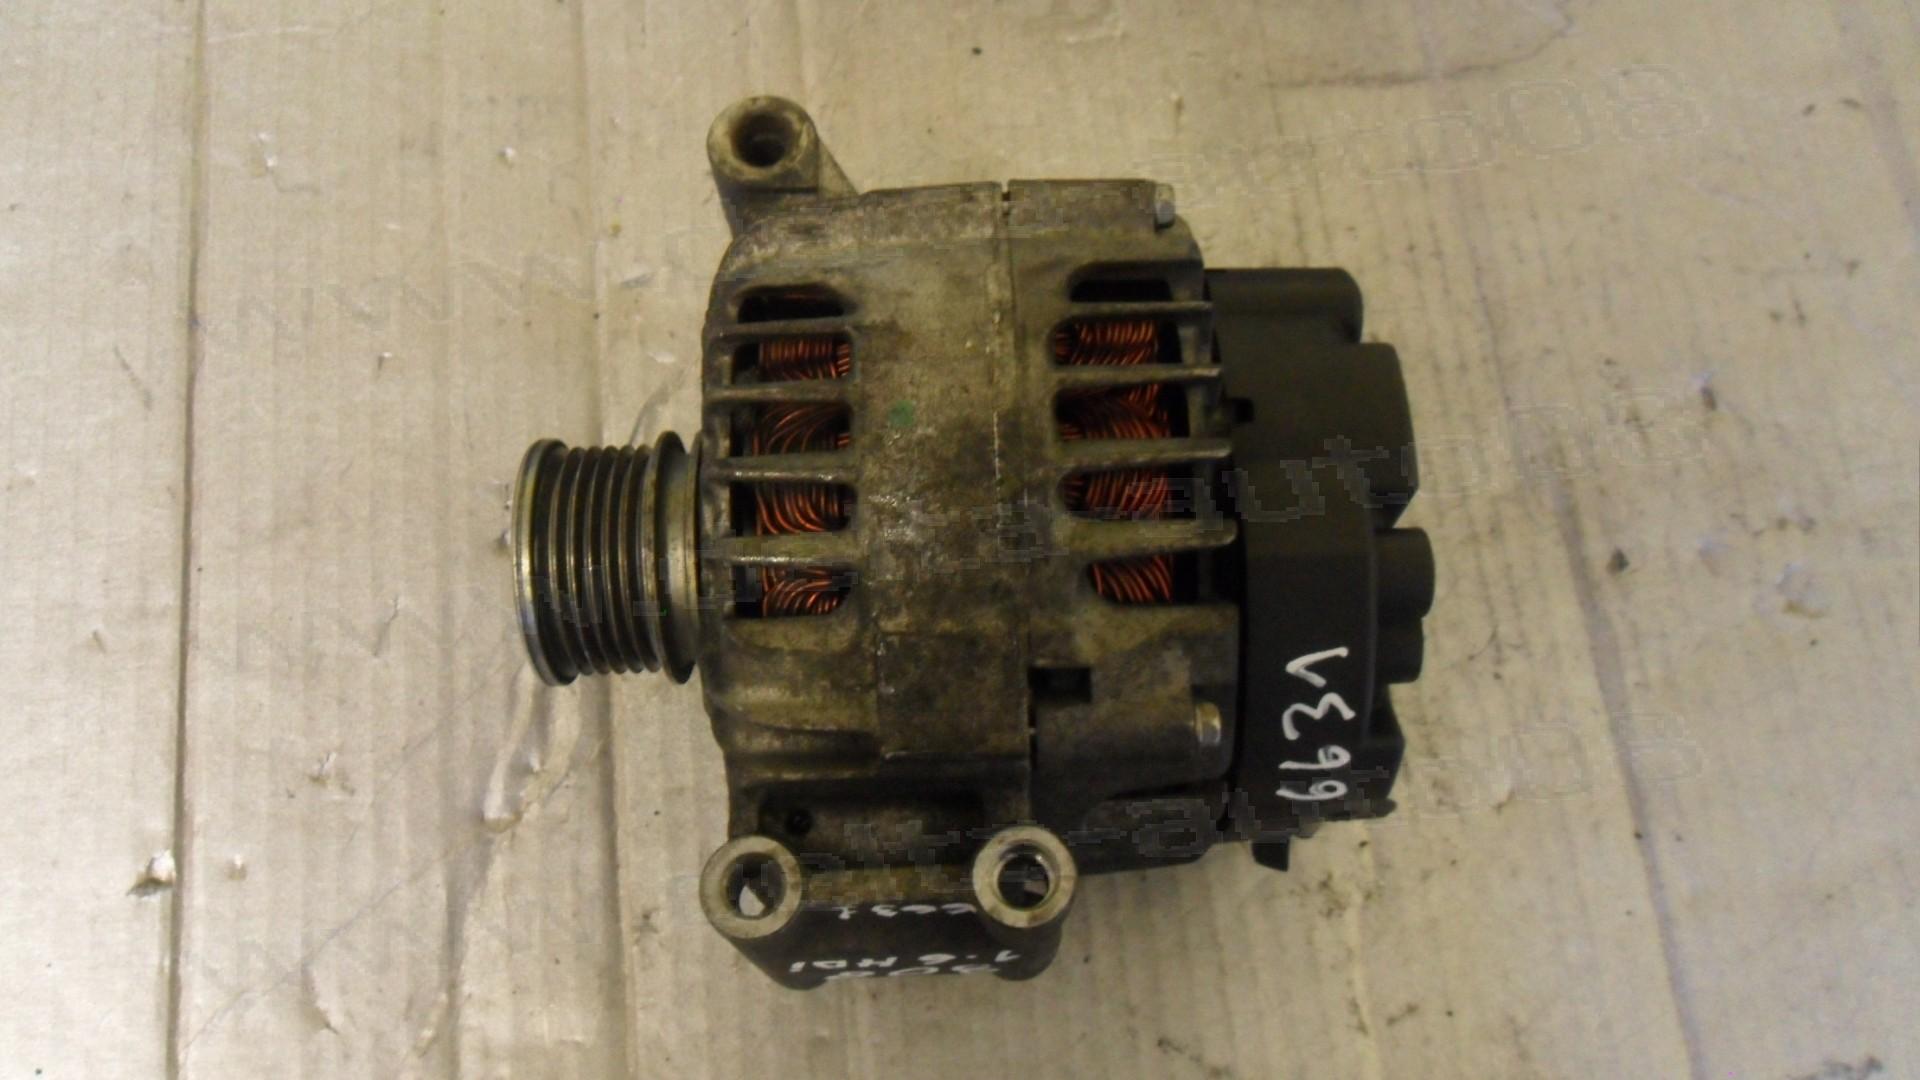 Алтернатор, генератор за Peugeot 308, Mini Clibman, 1.6 HDI, 2007-2015г., V 7576513 80-01, V75765138001, V757651380-01, 2605106A